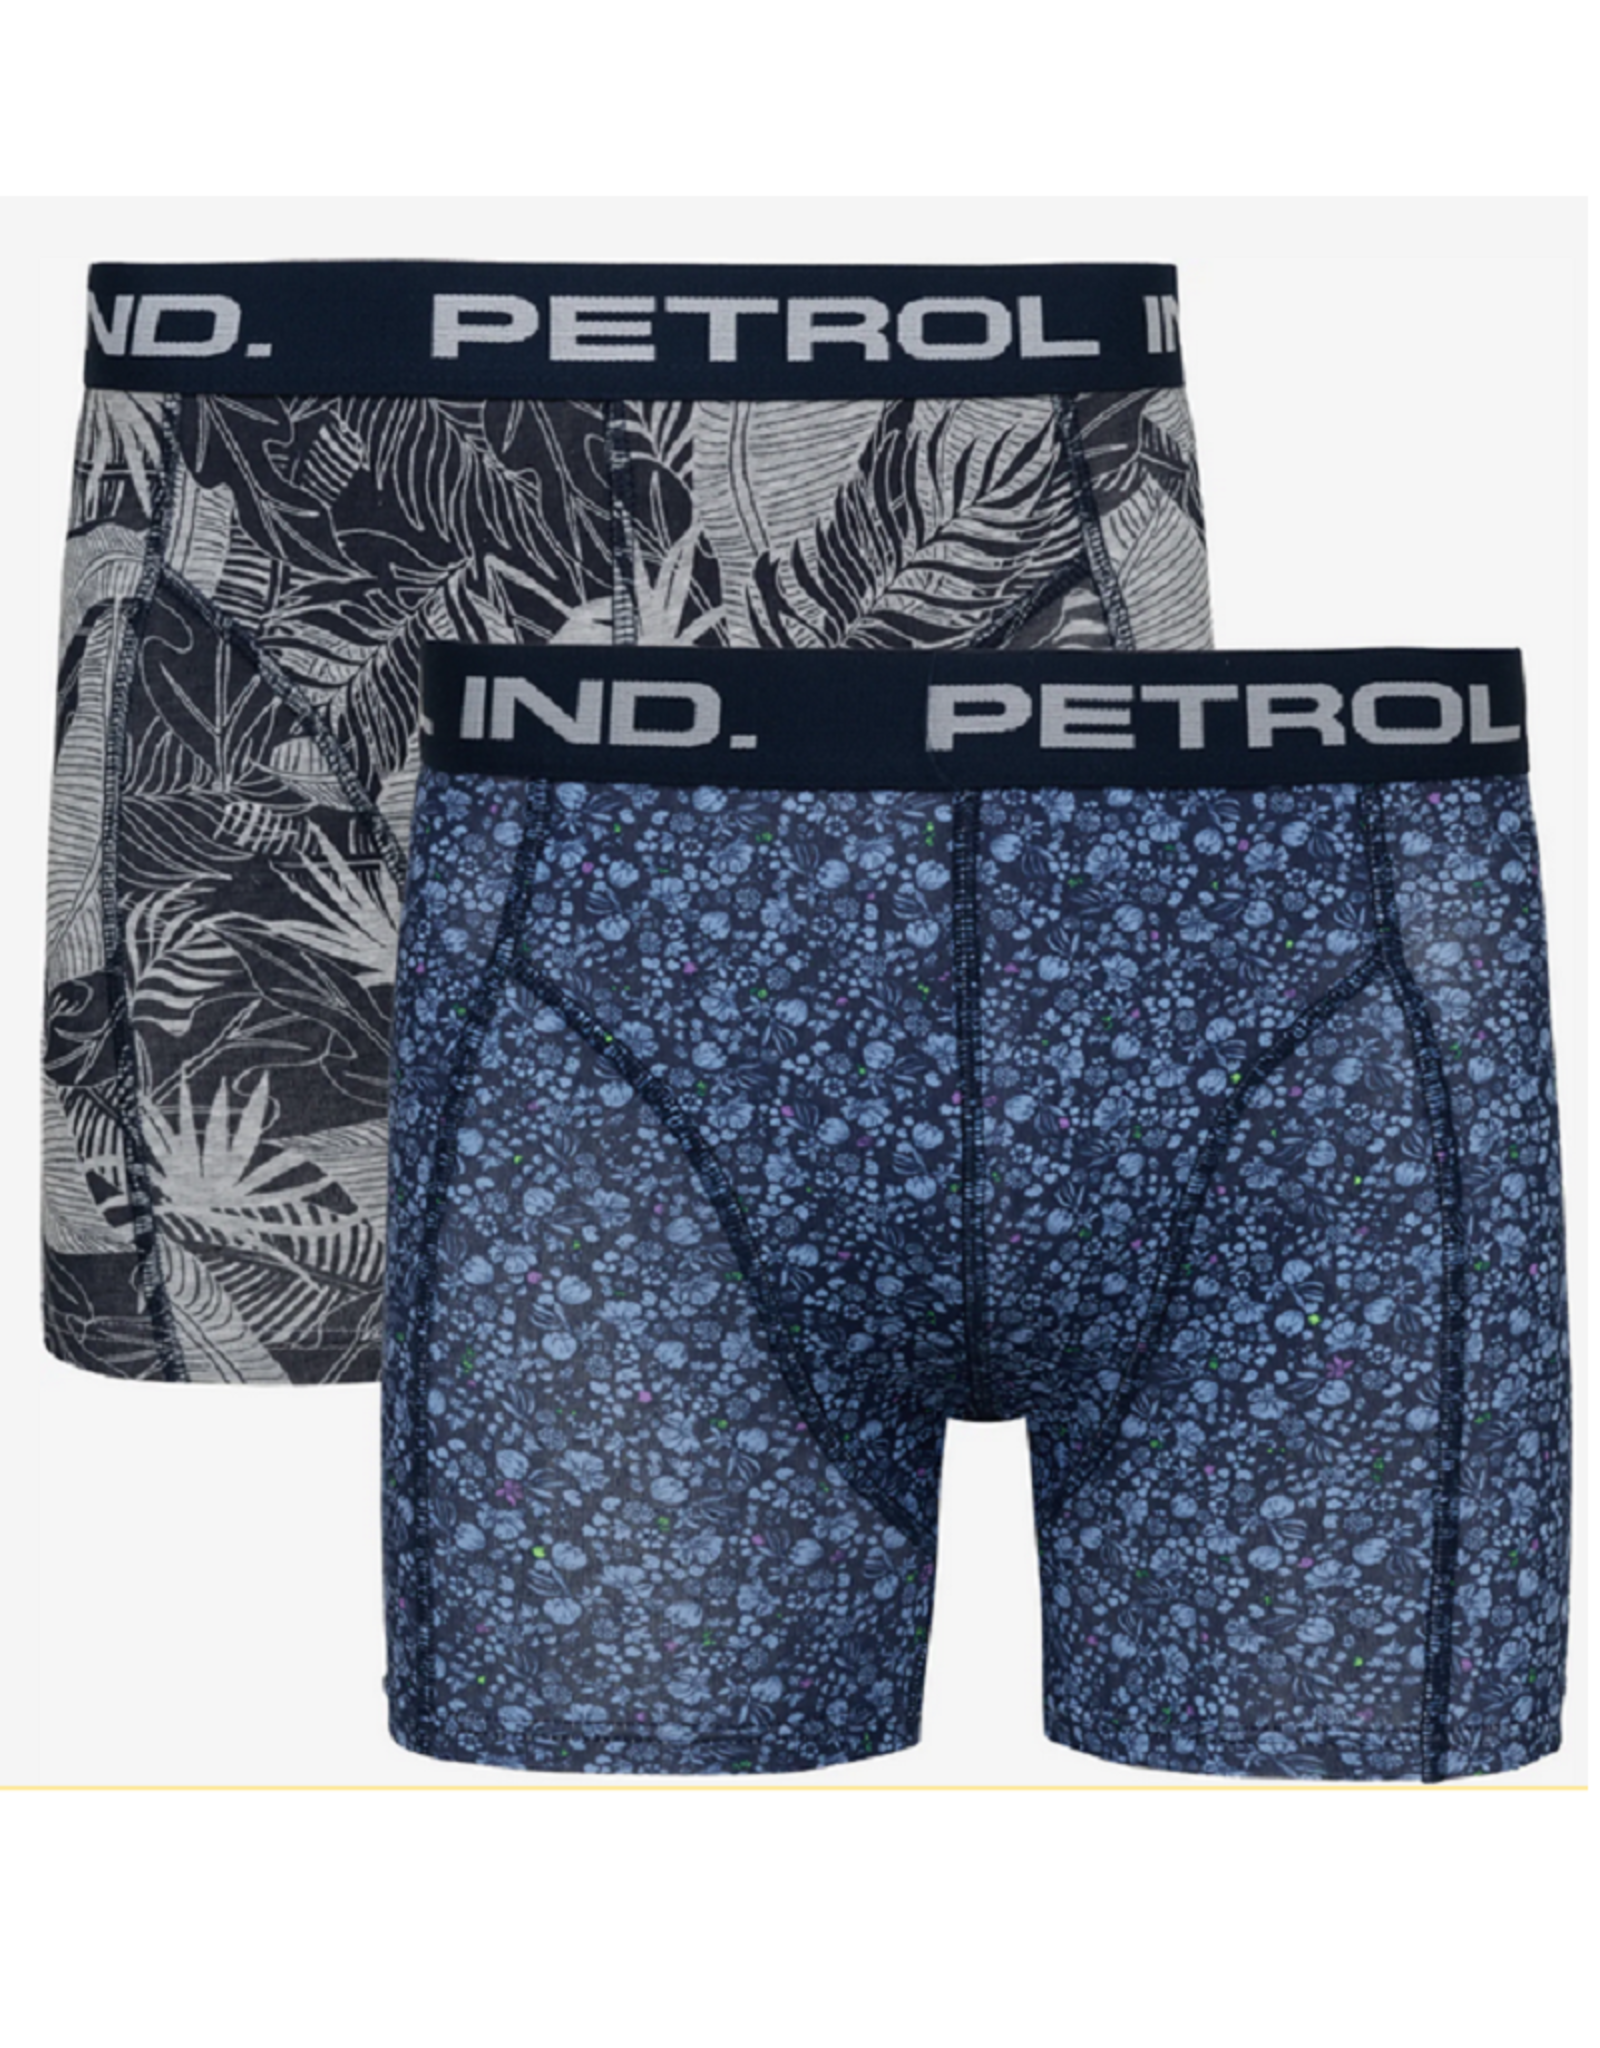 Petrol Ind. Petrol Boxershorts 2-pack